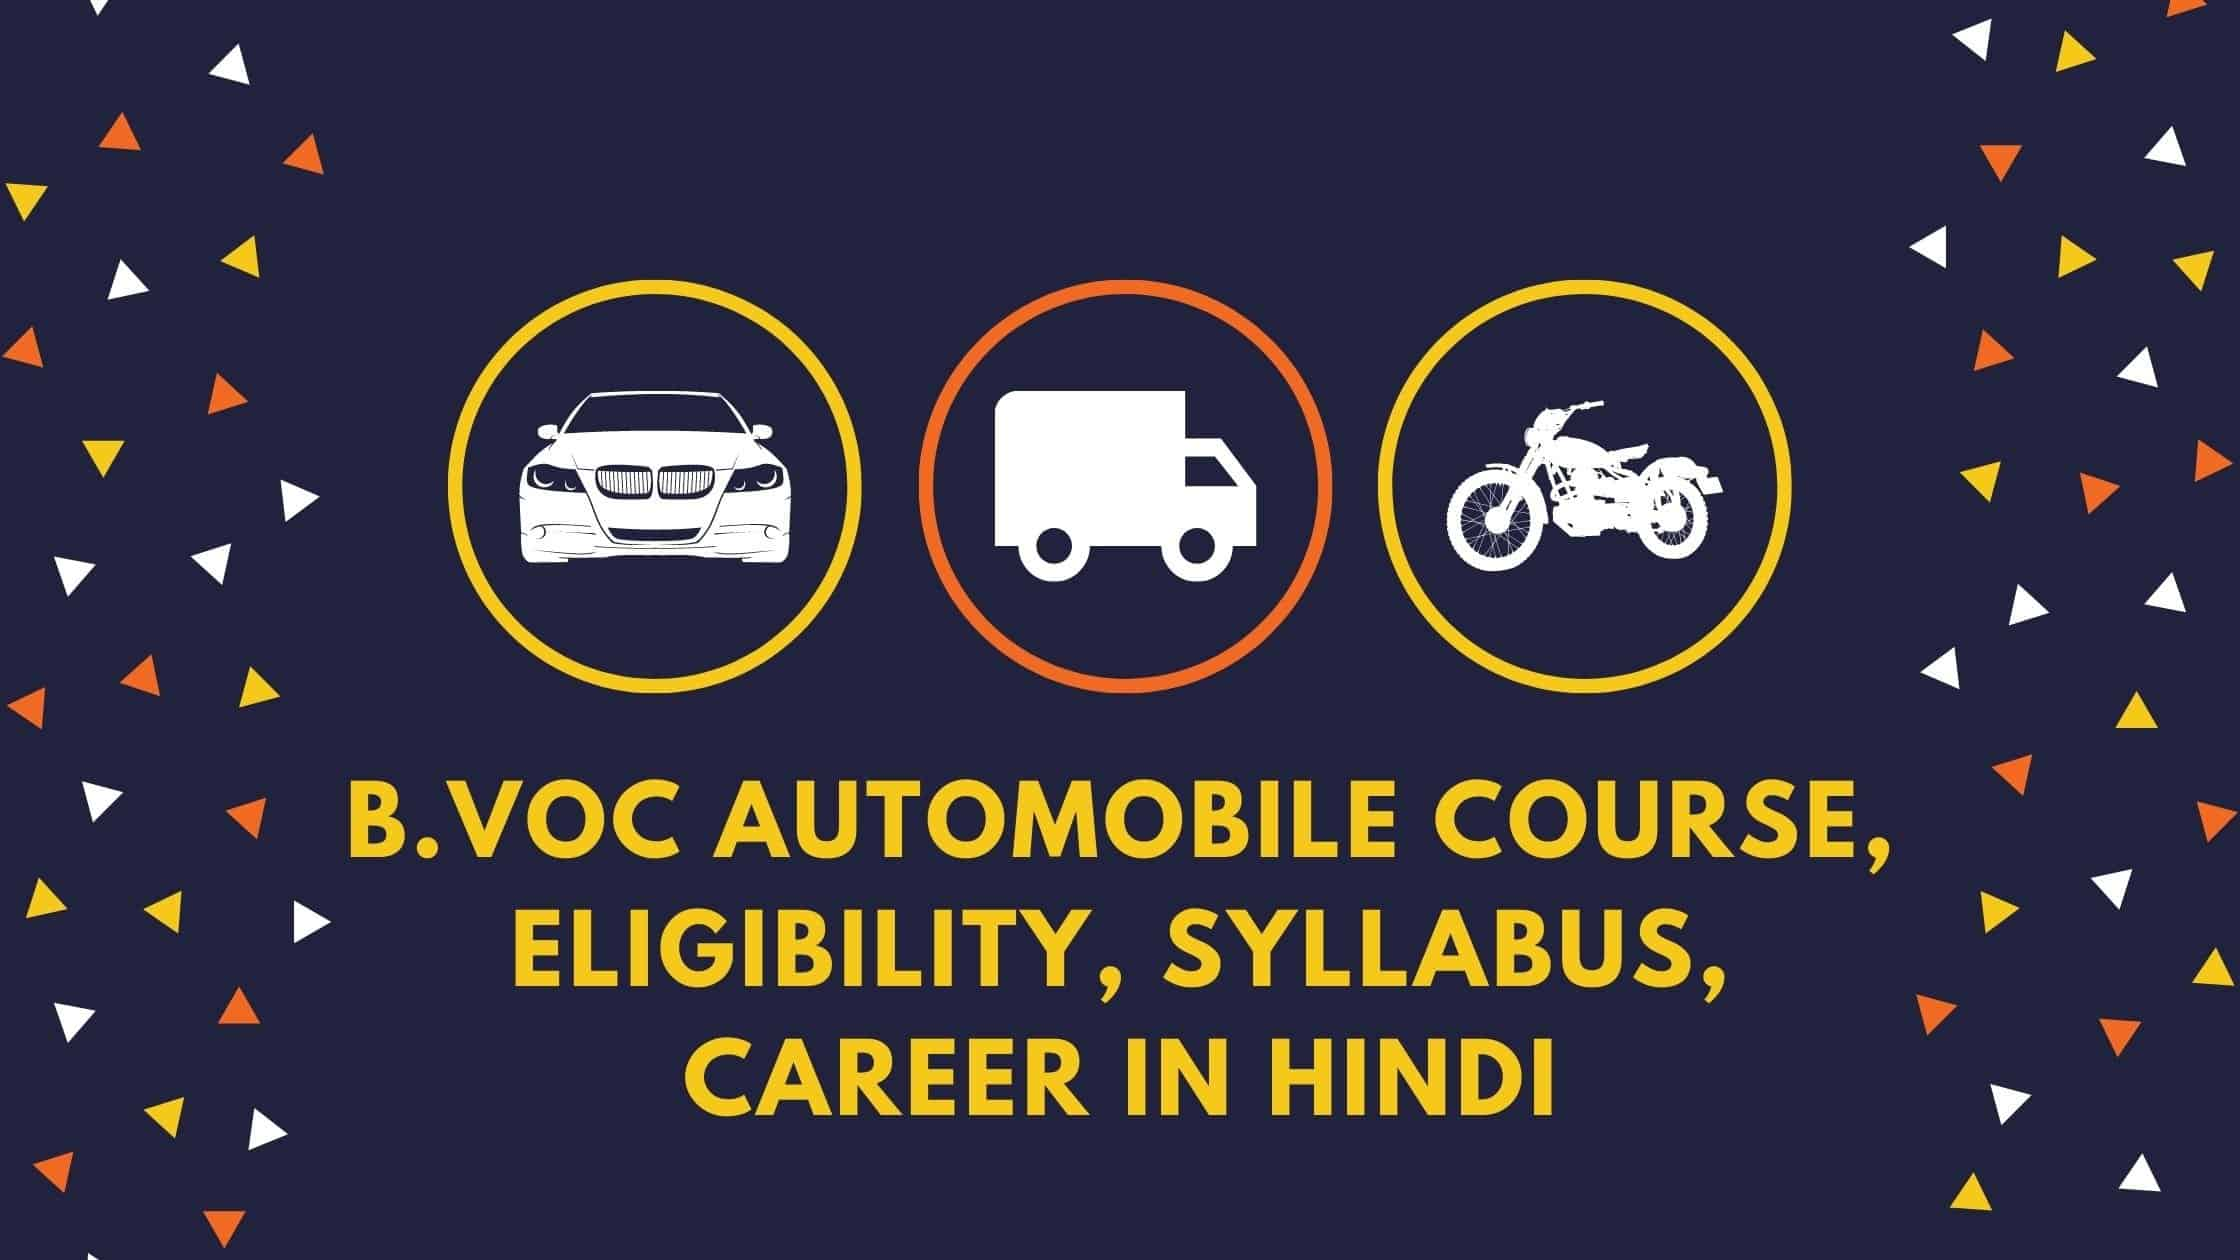 B.Voc Automobile Course, Eligibility, Syllabus, Career in Hindi